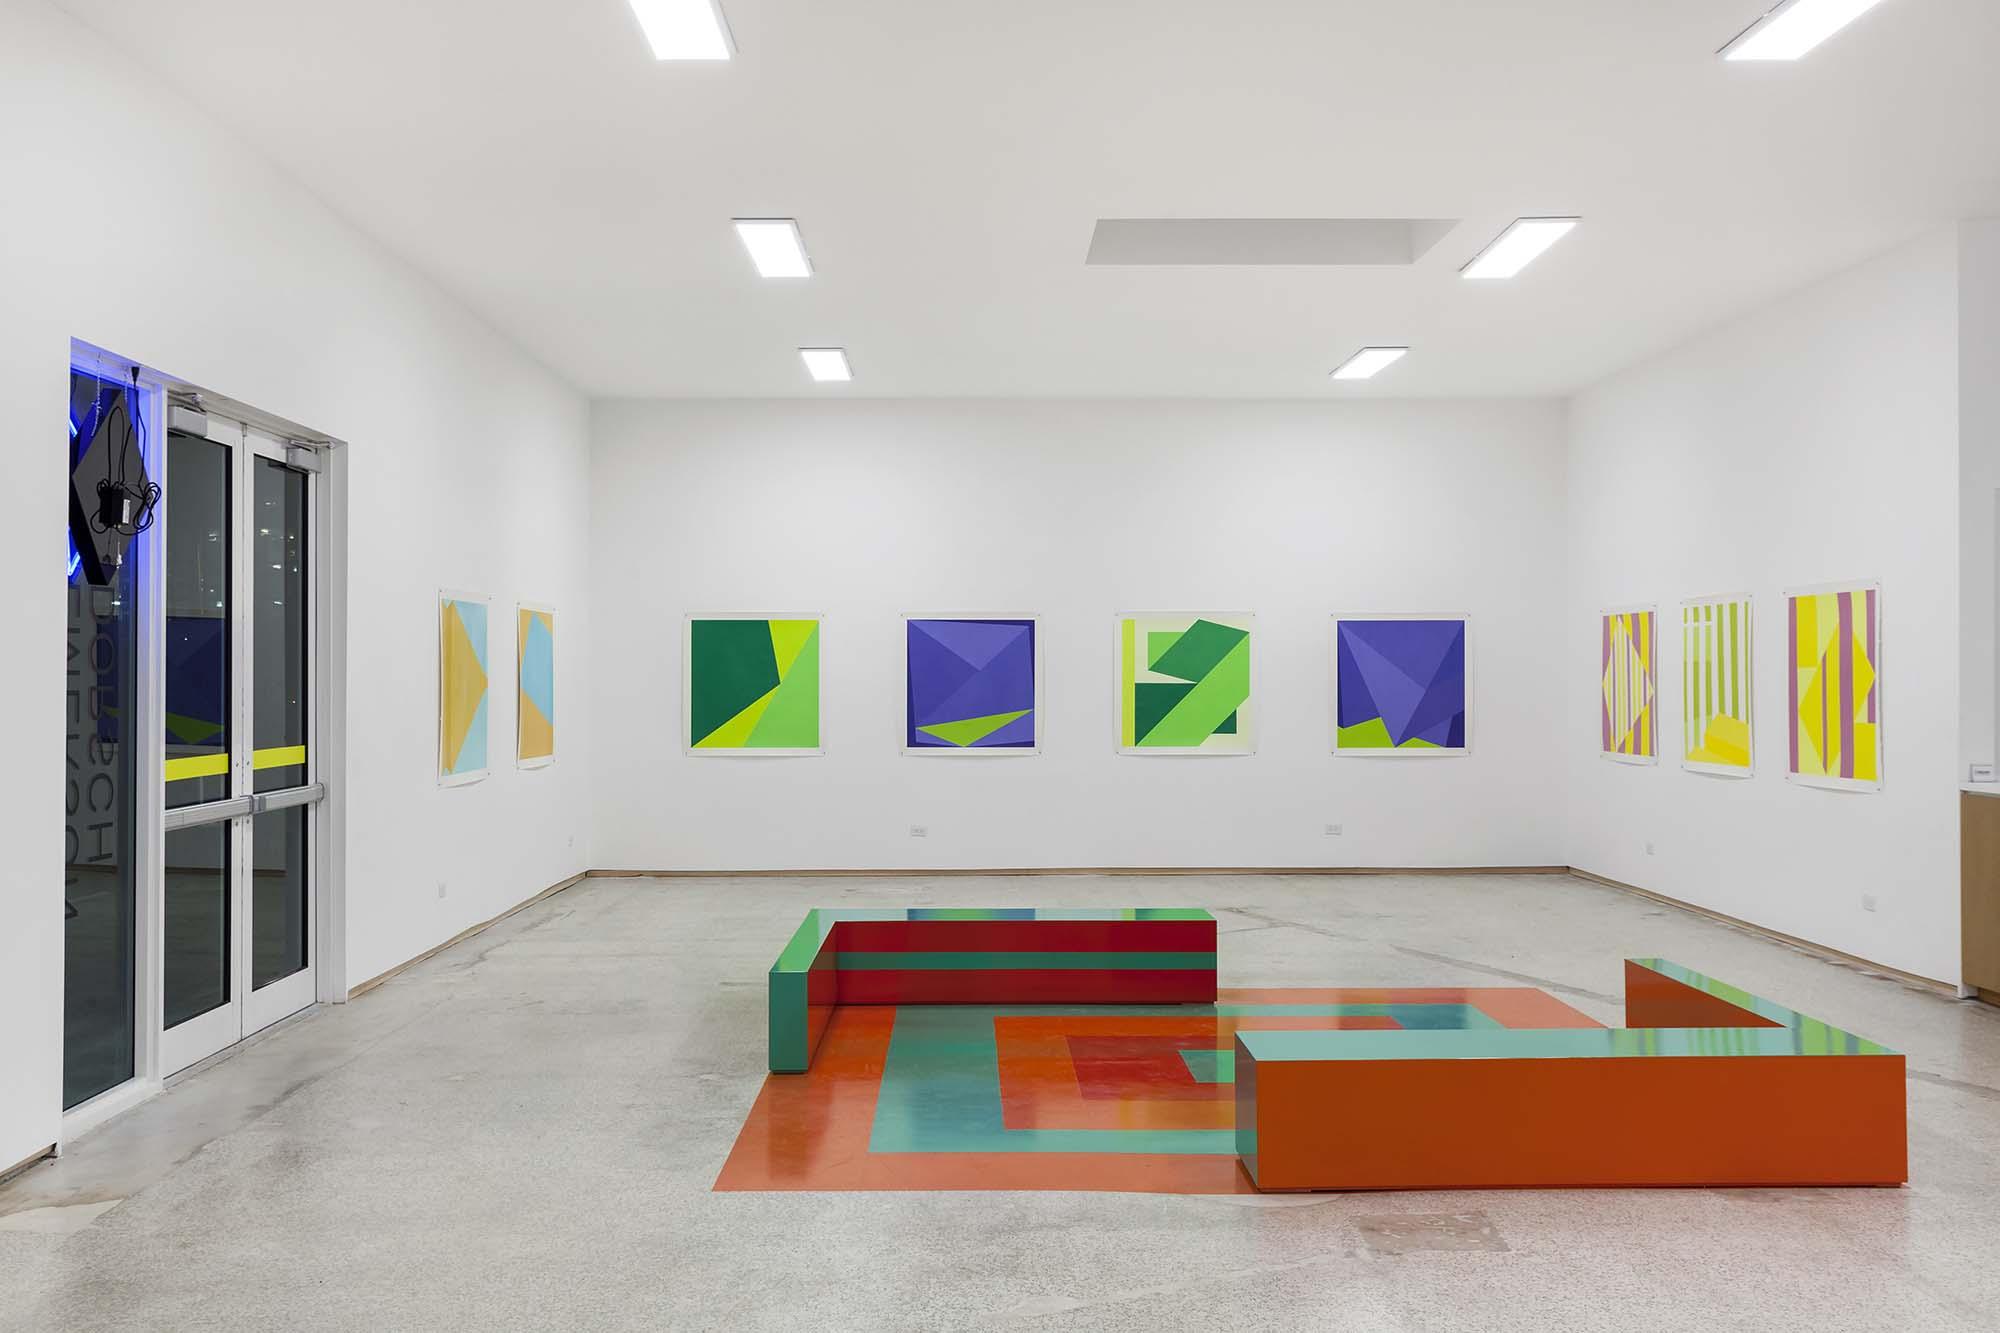 Karen Rifas, Per Forms (installation view), 2017